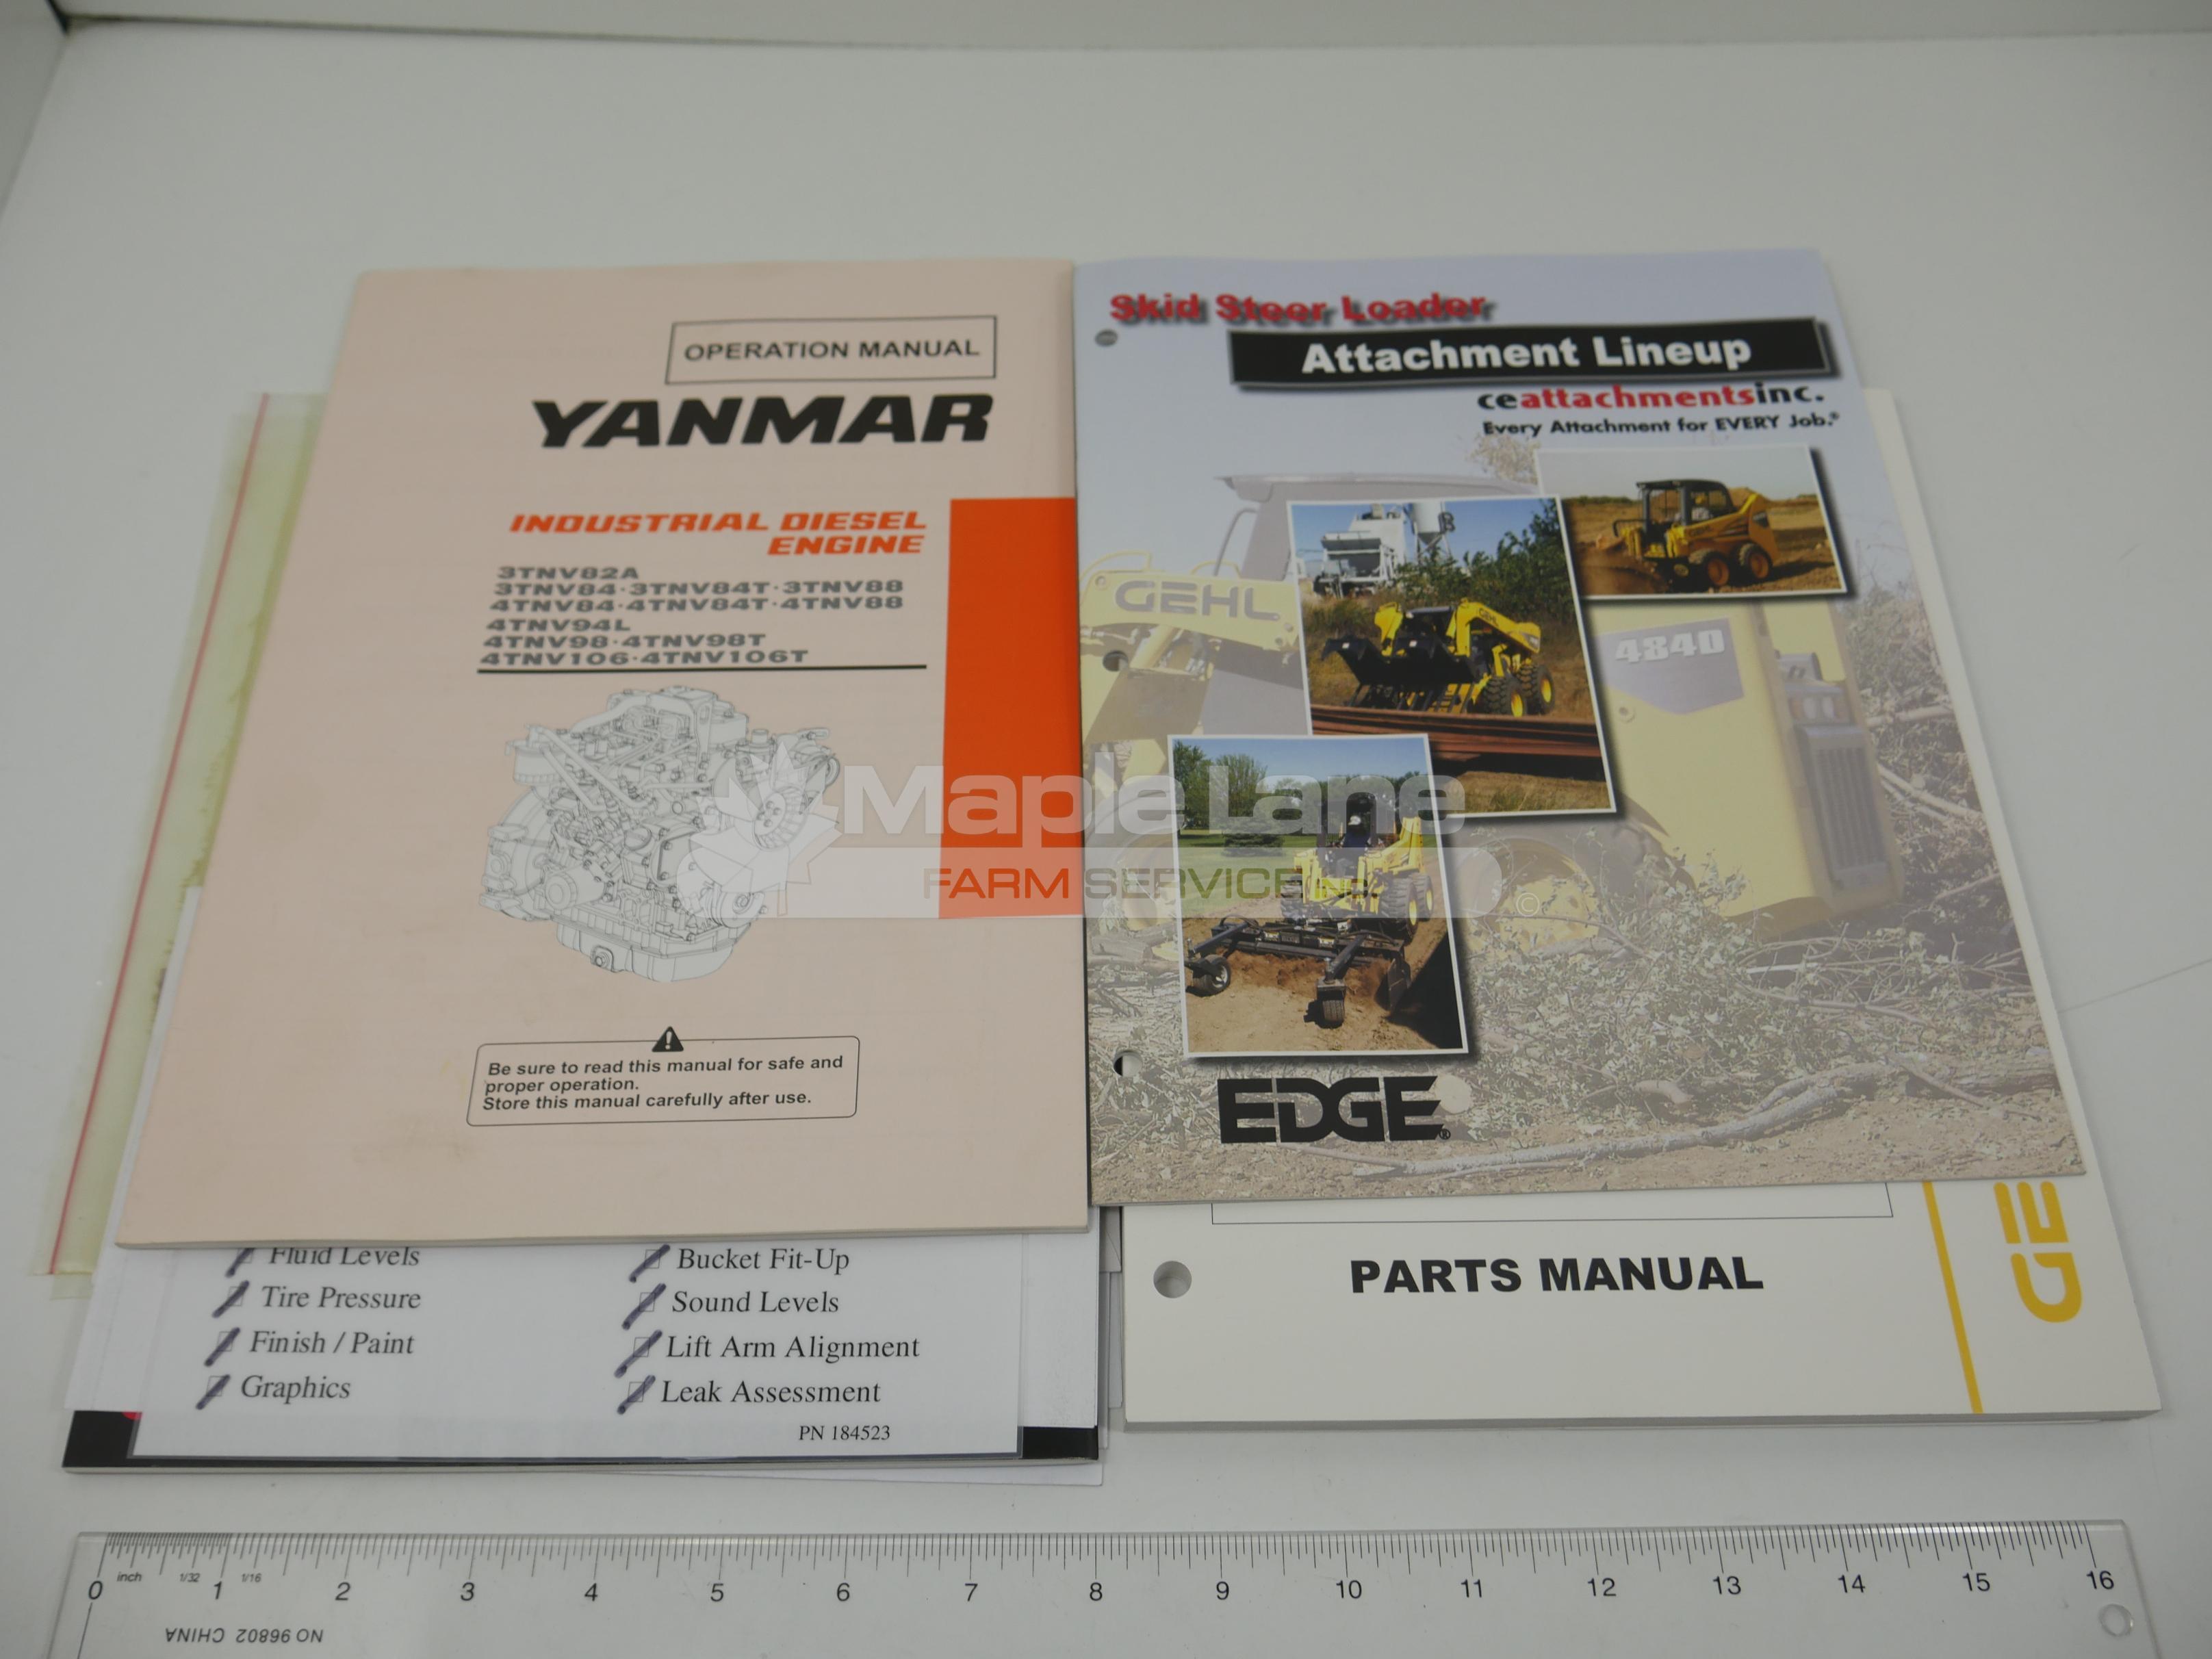 908267 Parts Manual